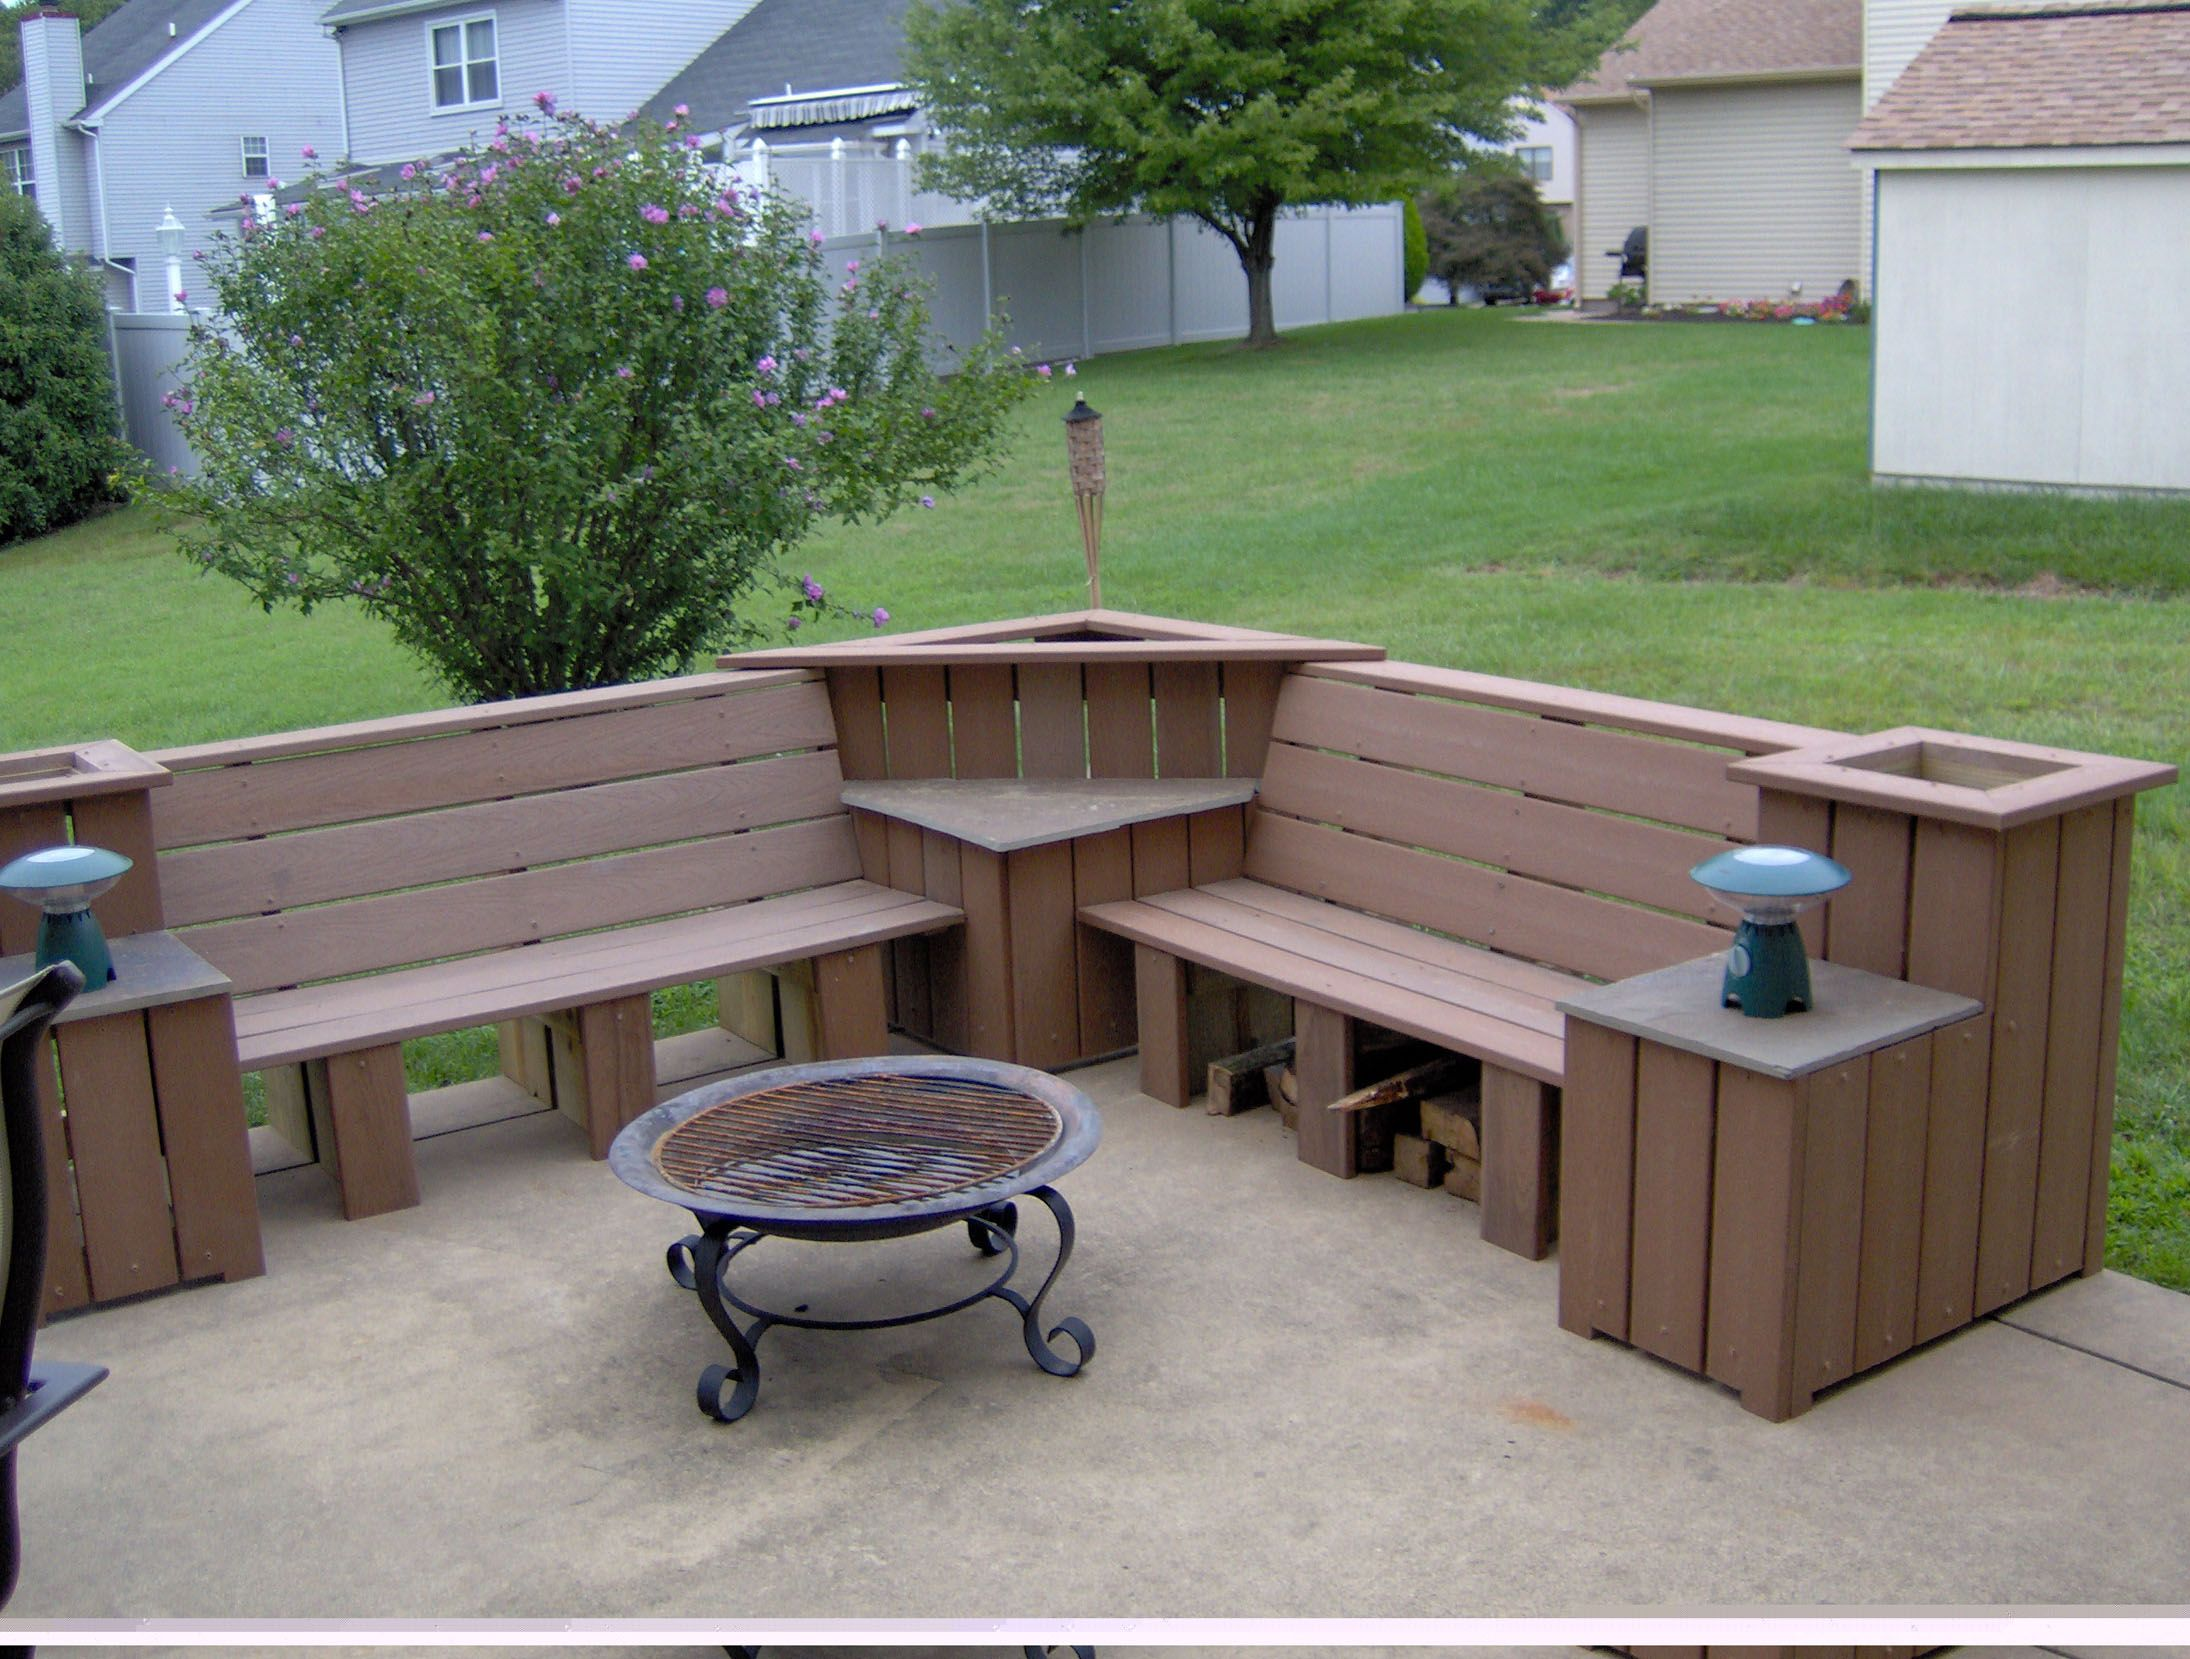 130 outdoor furniture ideas outdoor